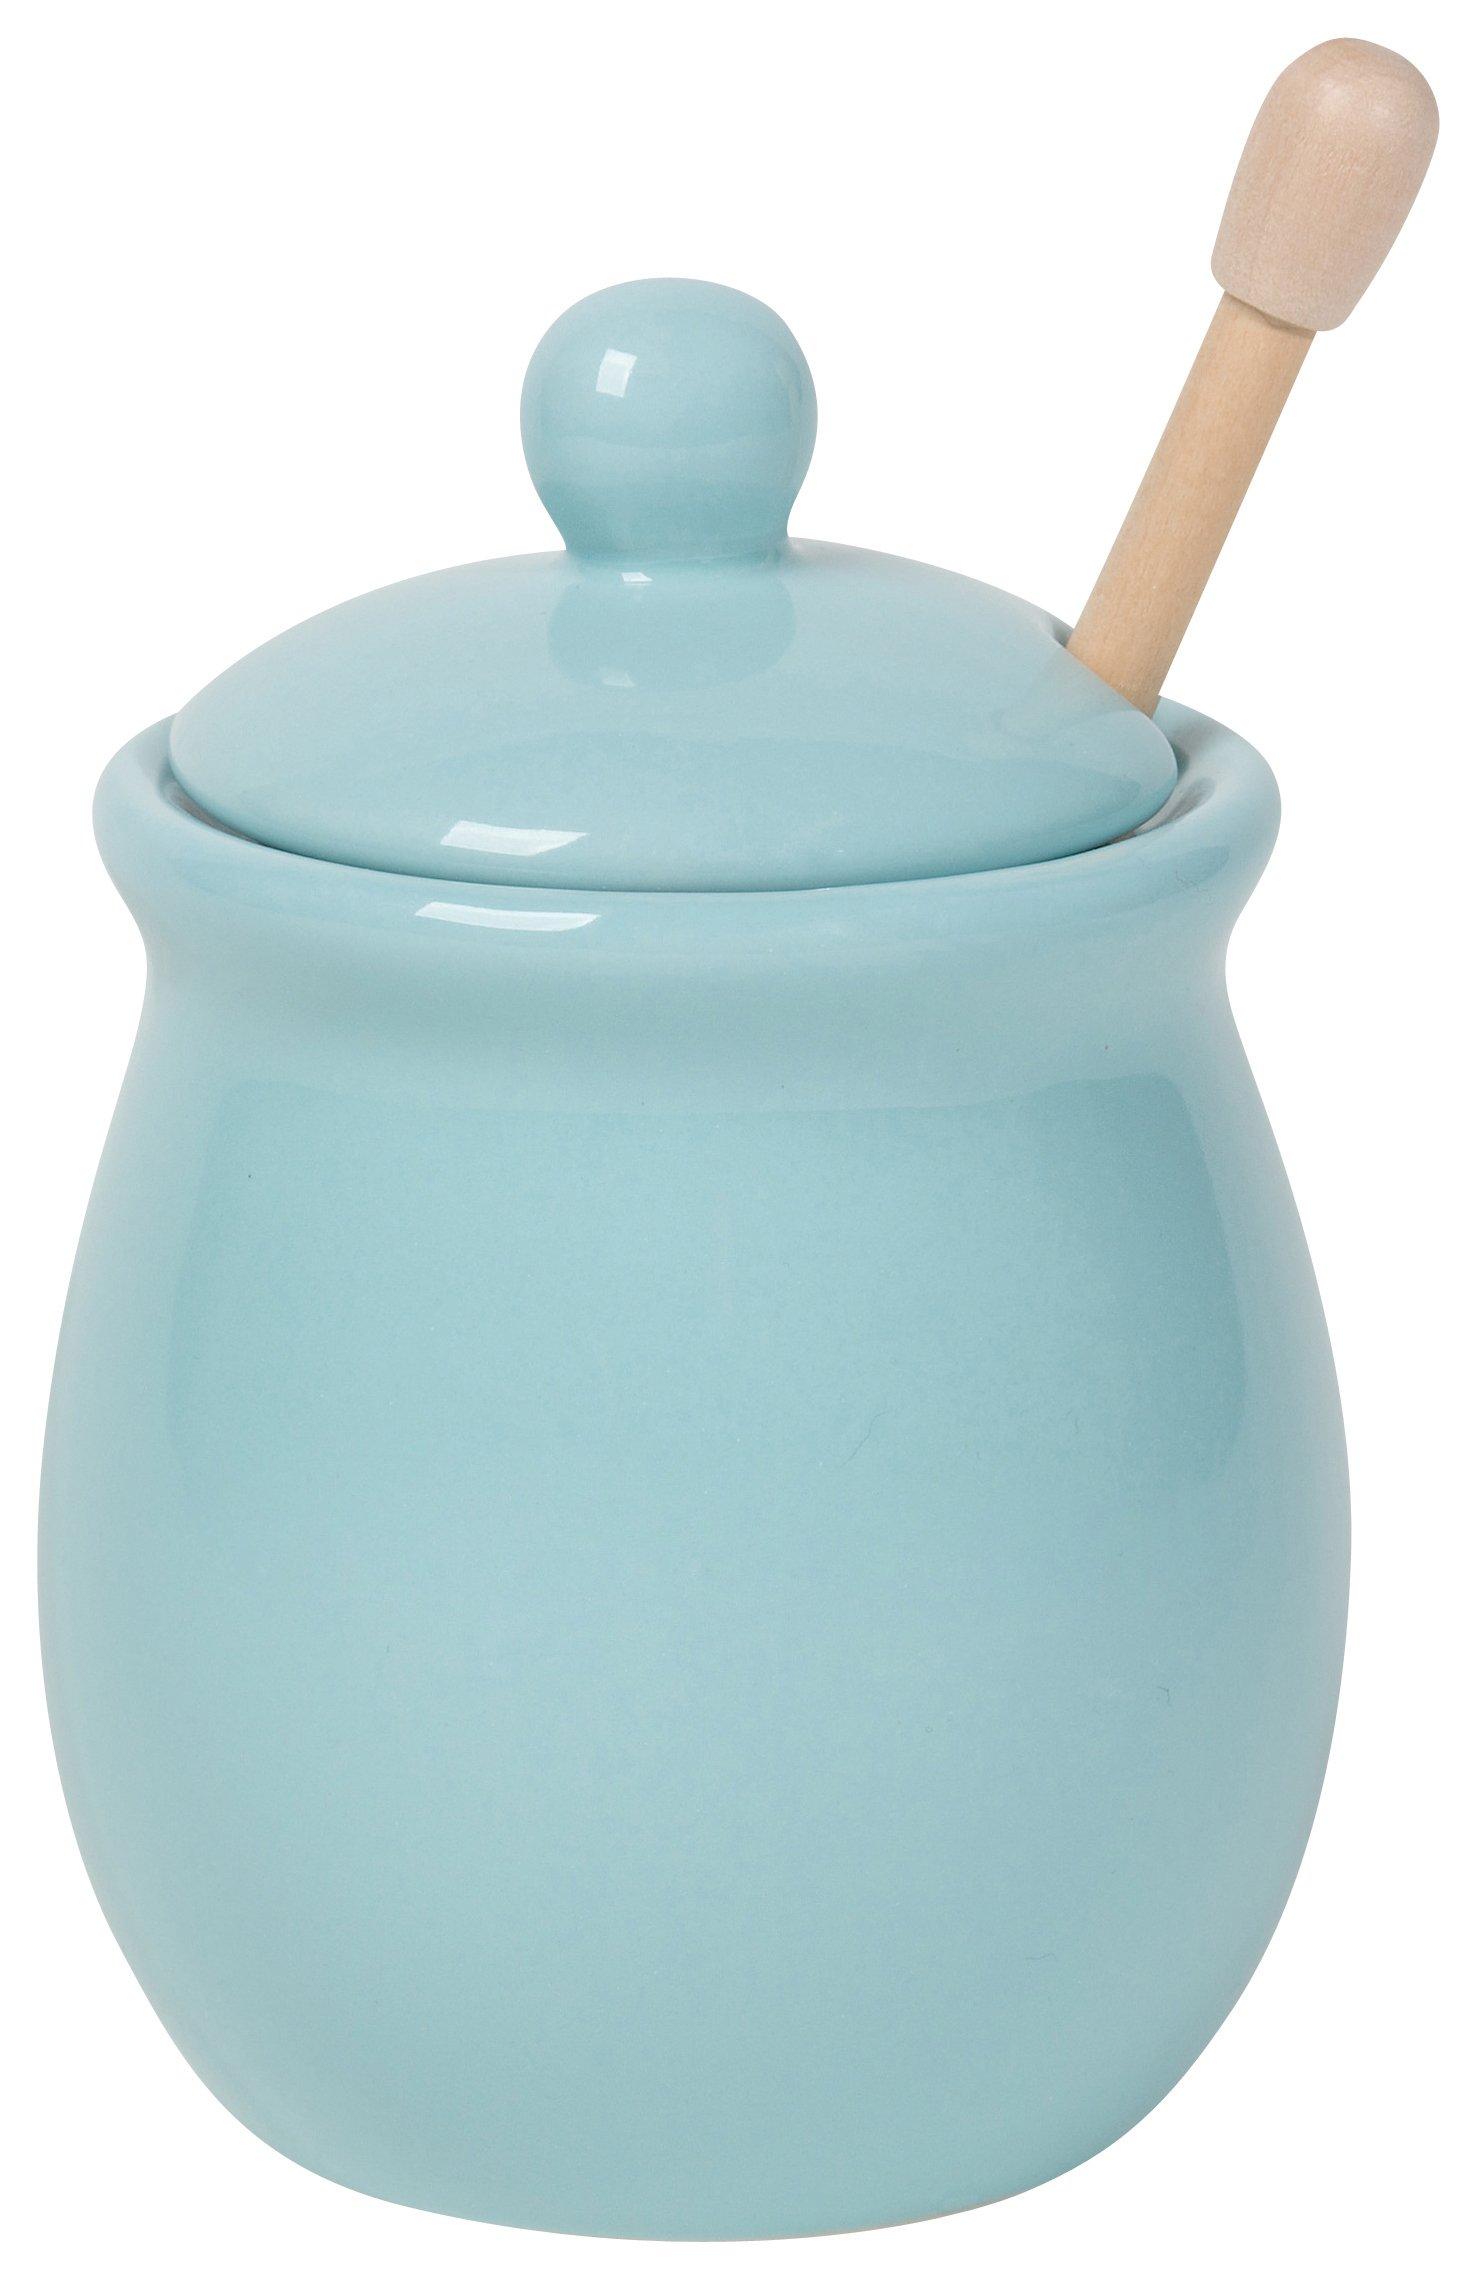 Now Designs Honey Pot with Wood Honey Dipper, Eggshell Blue